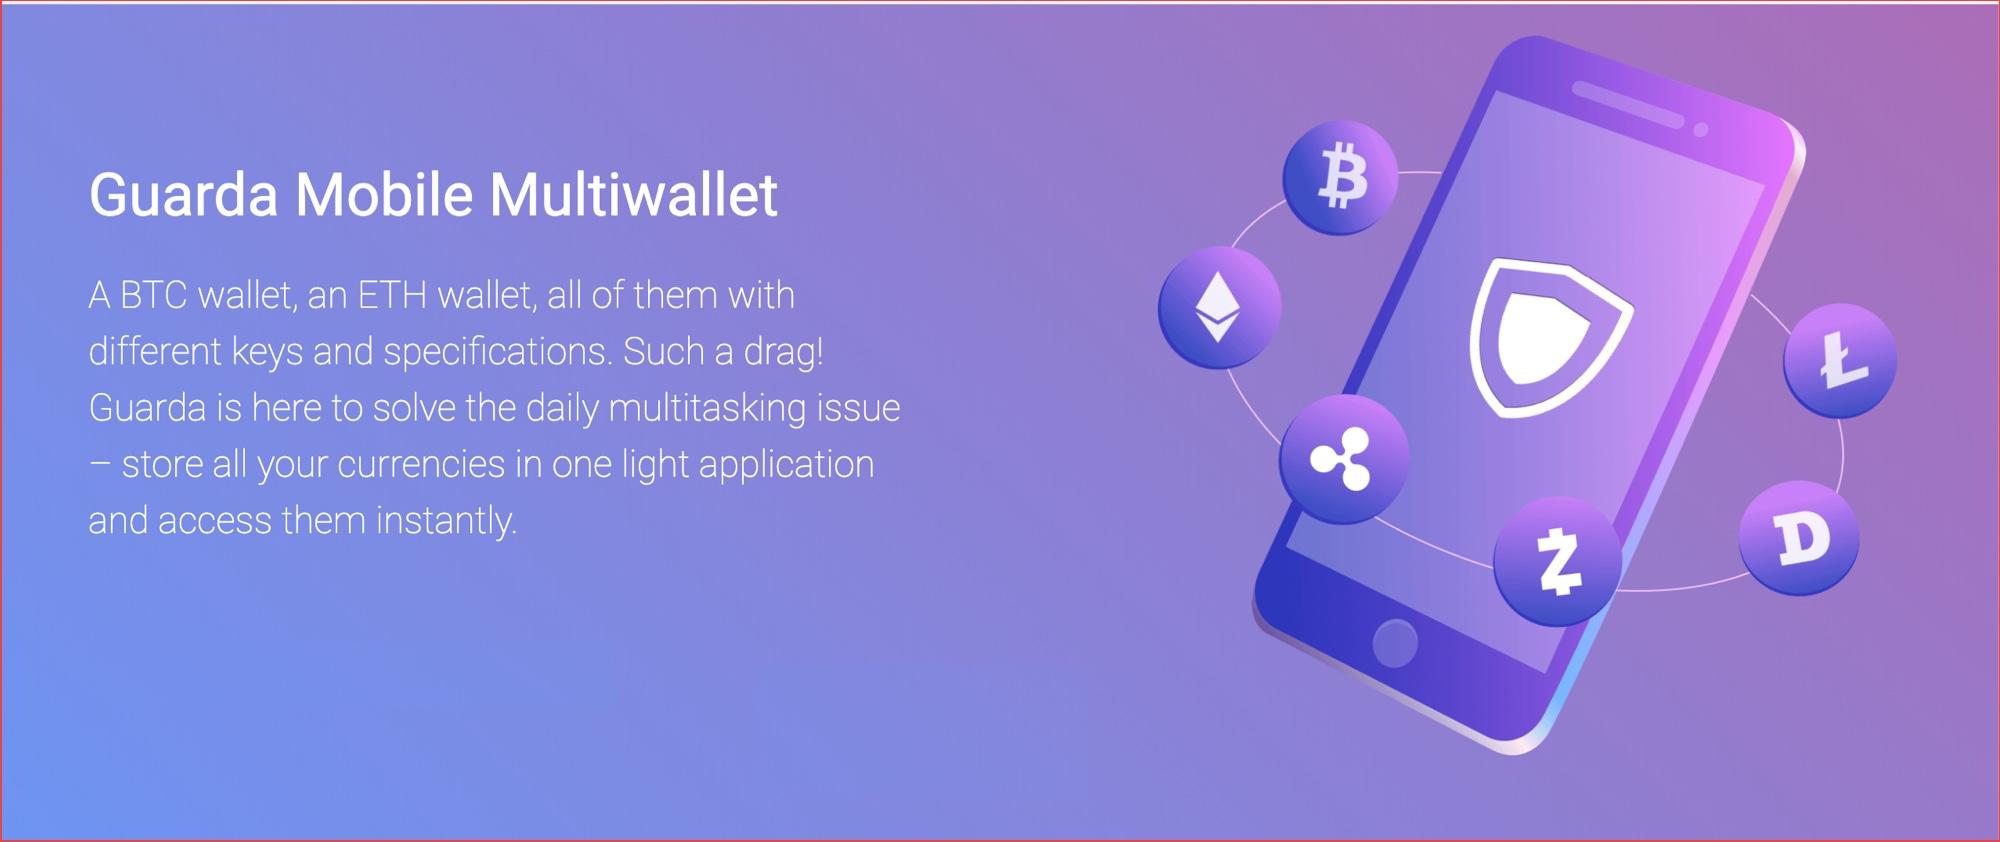 Guarda Wallet Review